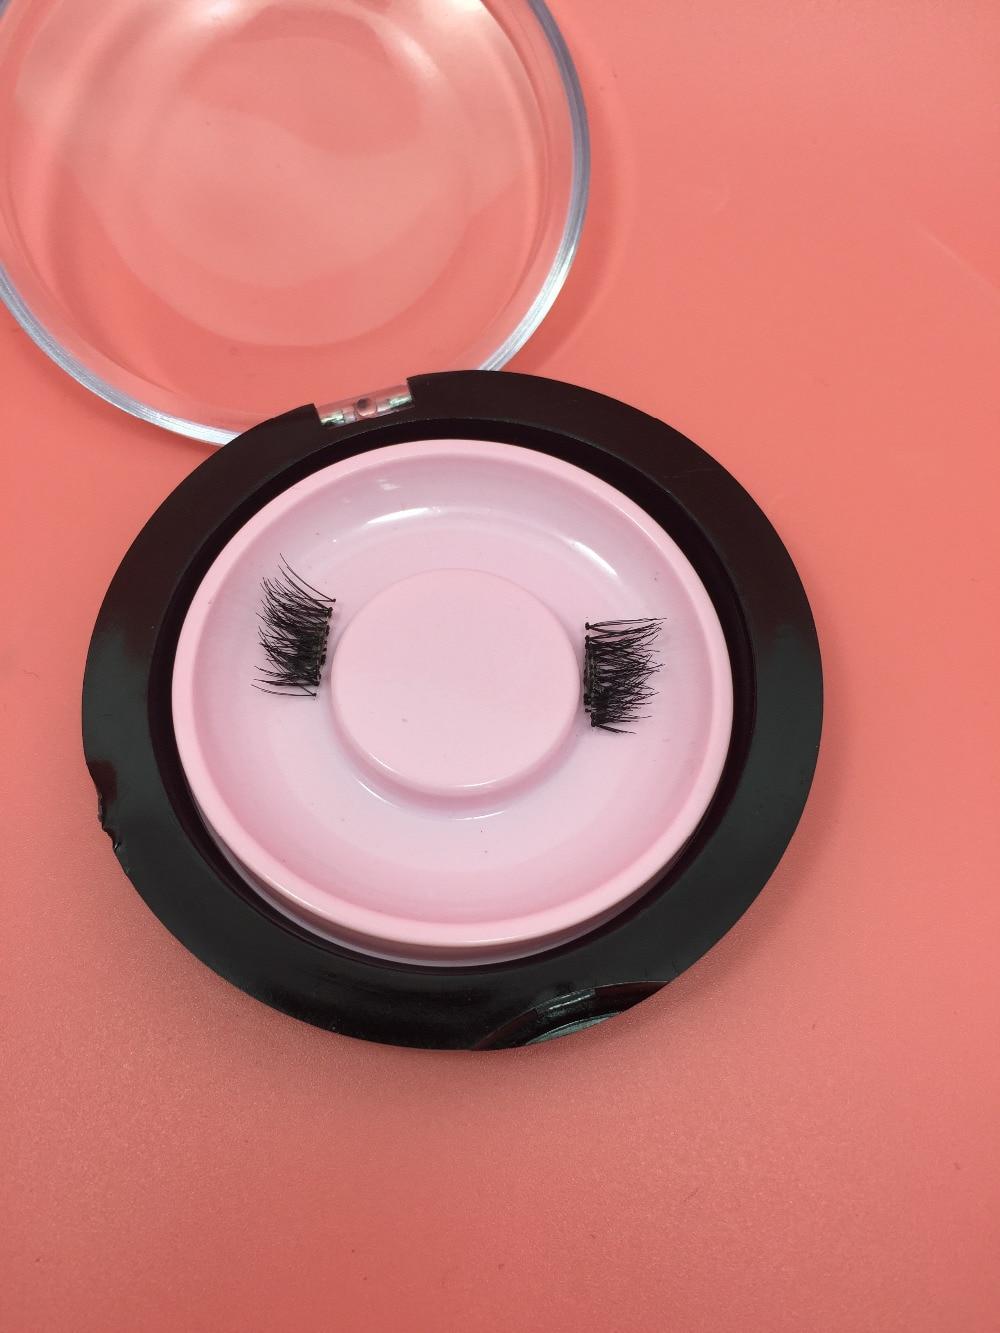 5pairs Magnetic eyelash extensions magnet False Fake Eyelashes extensions 4pcs/pair Handmade  soft and Comfortable цена 2016